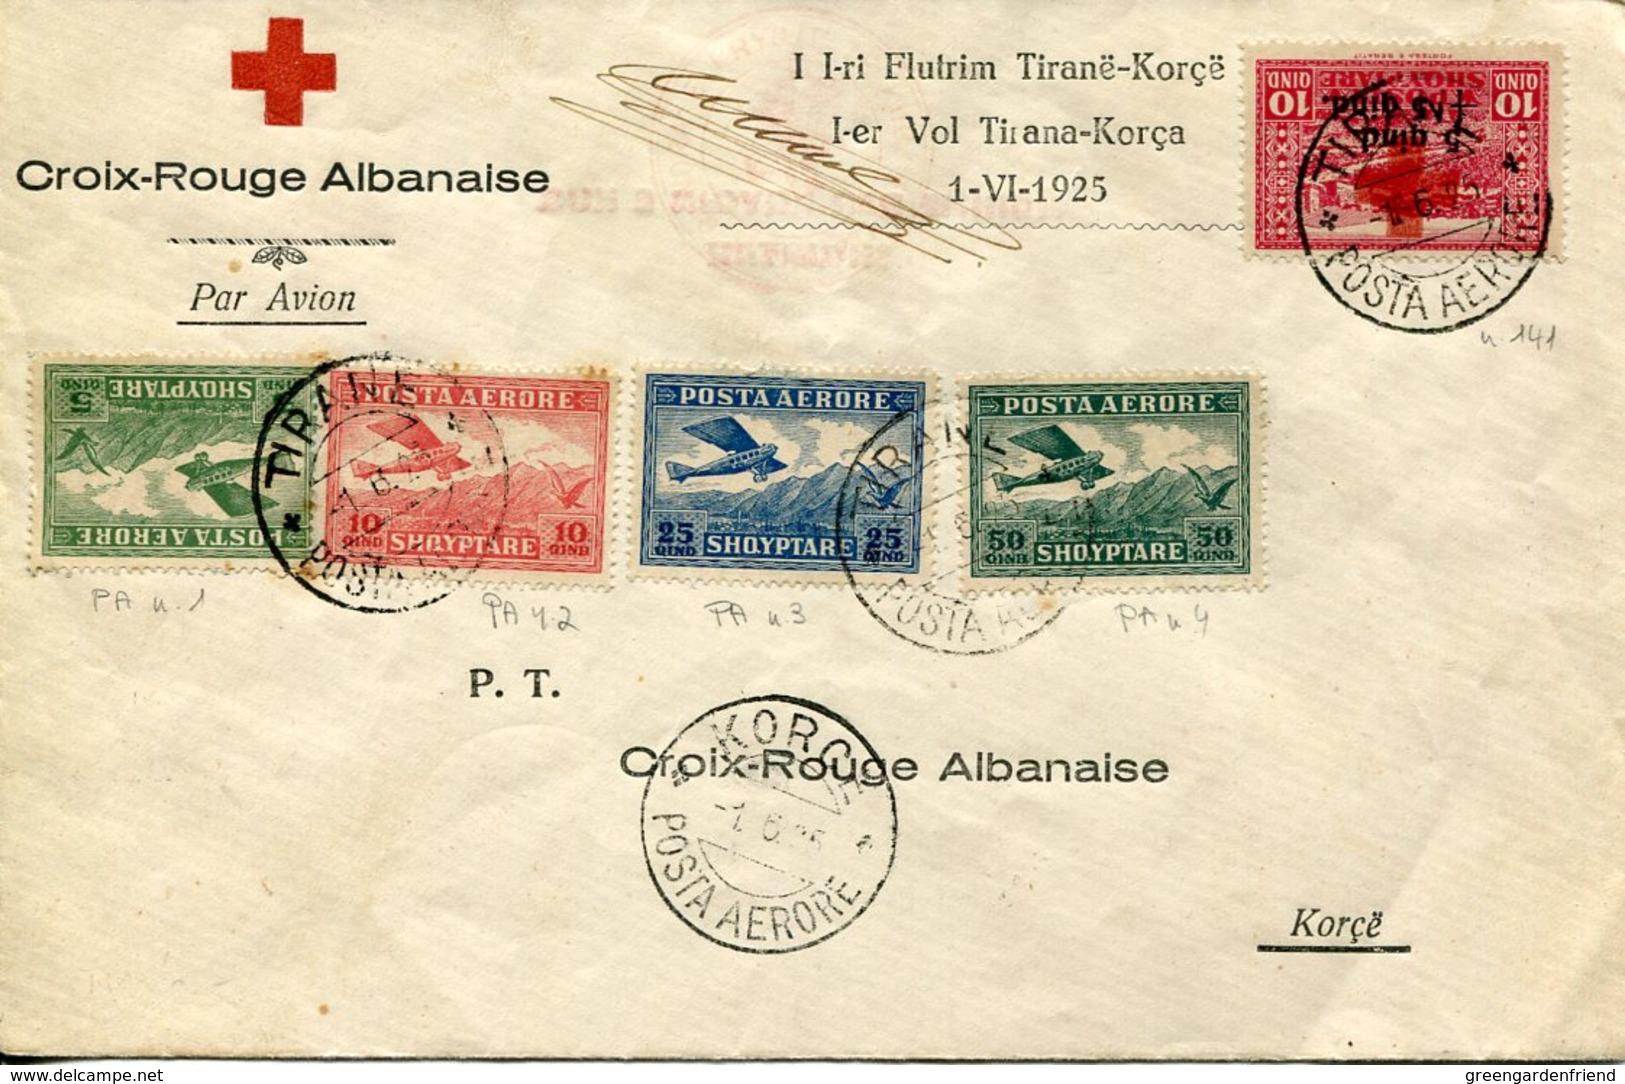 37050 Albania, Croix Rouge 1er Vol Tirana Korca 1-VI-1925 Posta Aerore (see 2 Scans) First Flight 1925 - Albanie